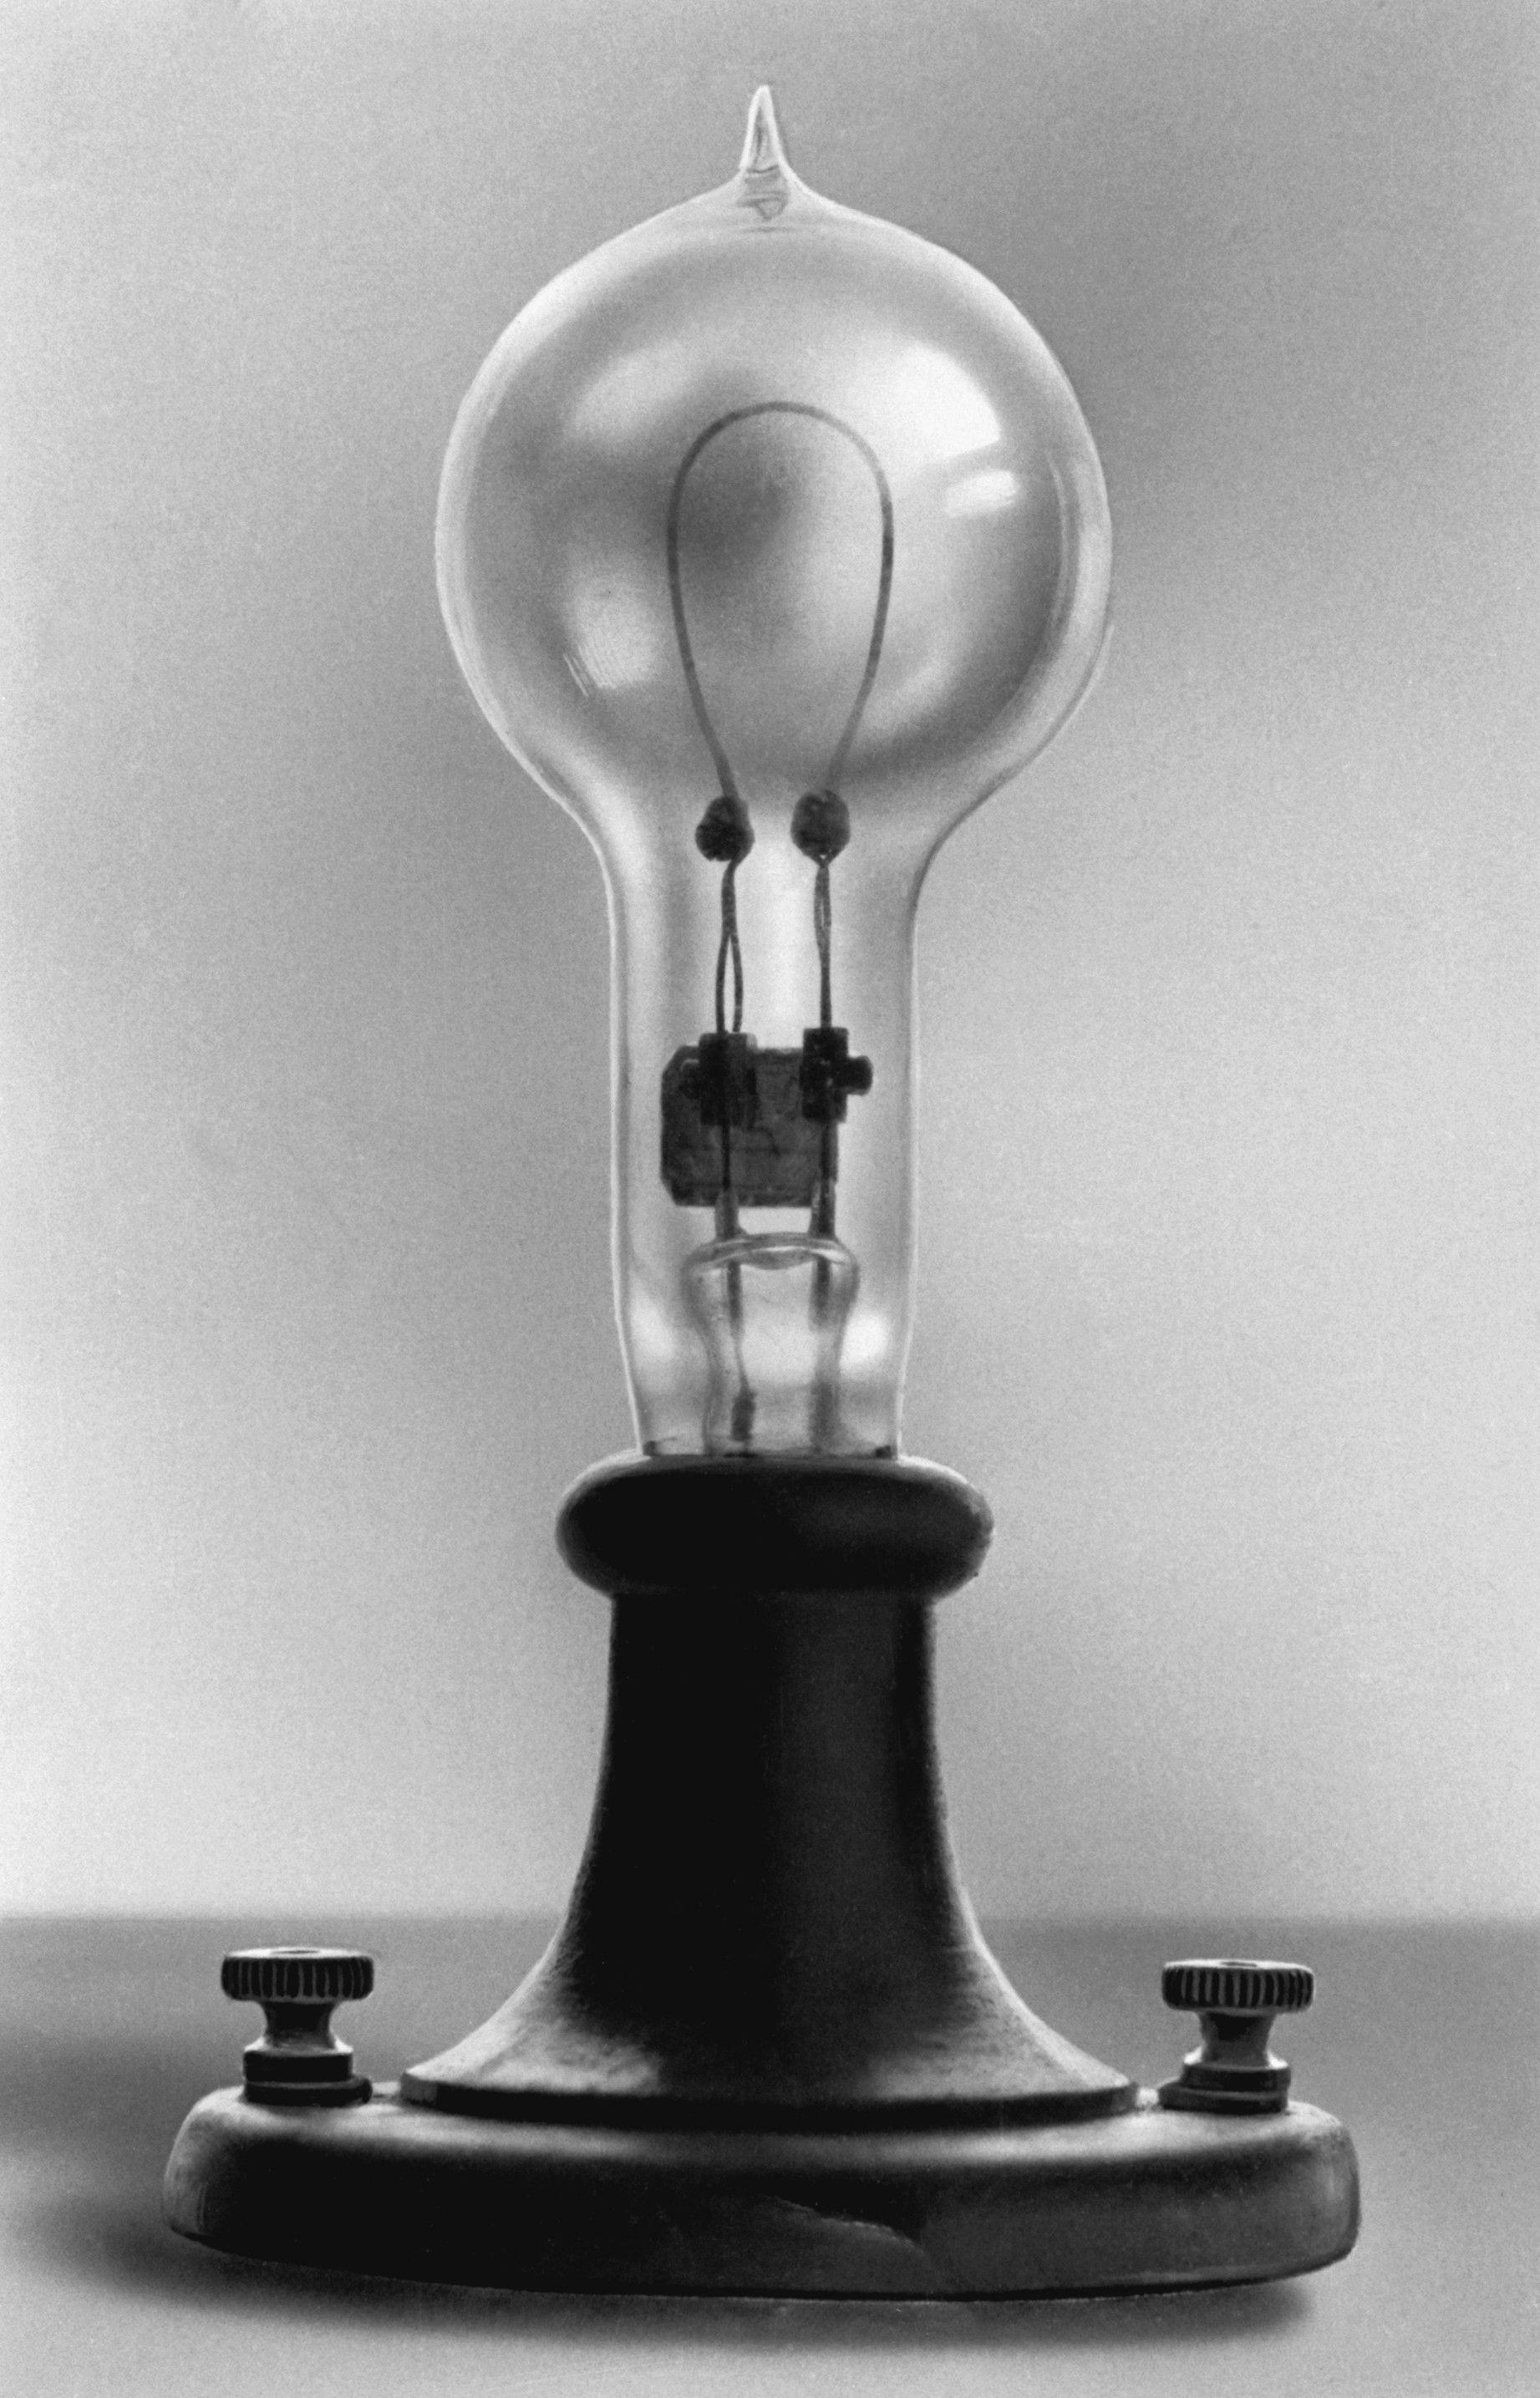 Thomas Edison's Light Bulb A major engineering